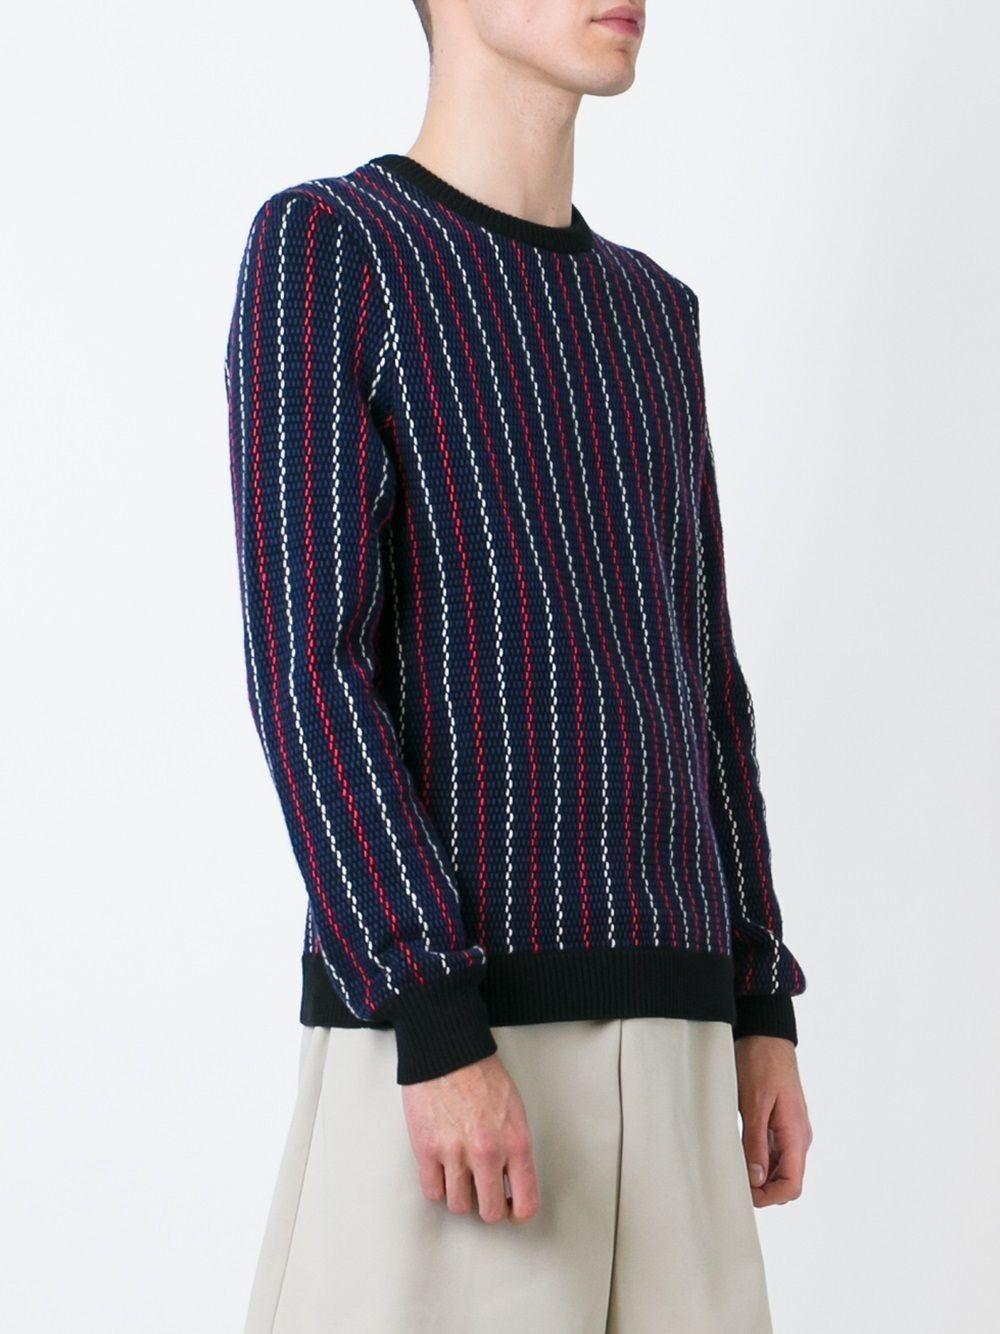 Carven bluee and Multi-colour Cotton Striped Jumper Unisex Size S